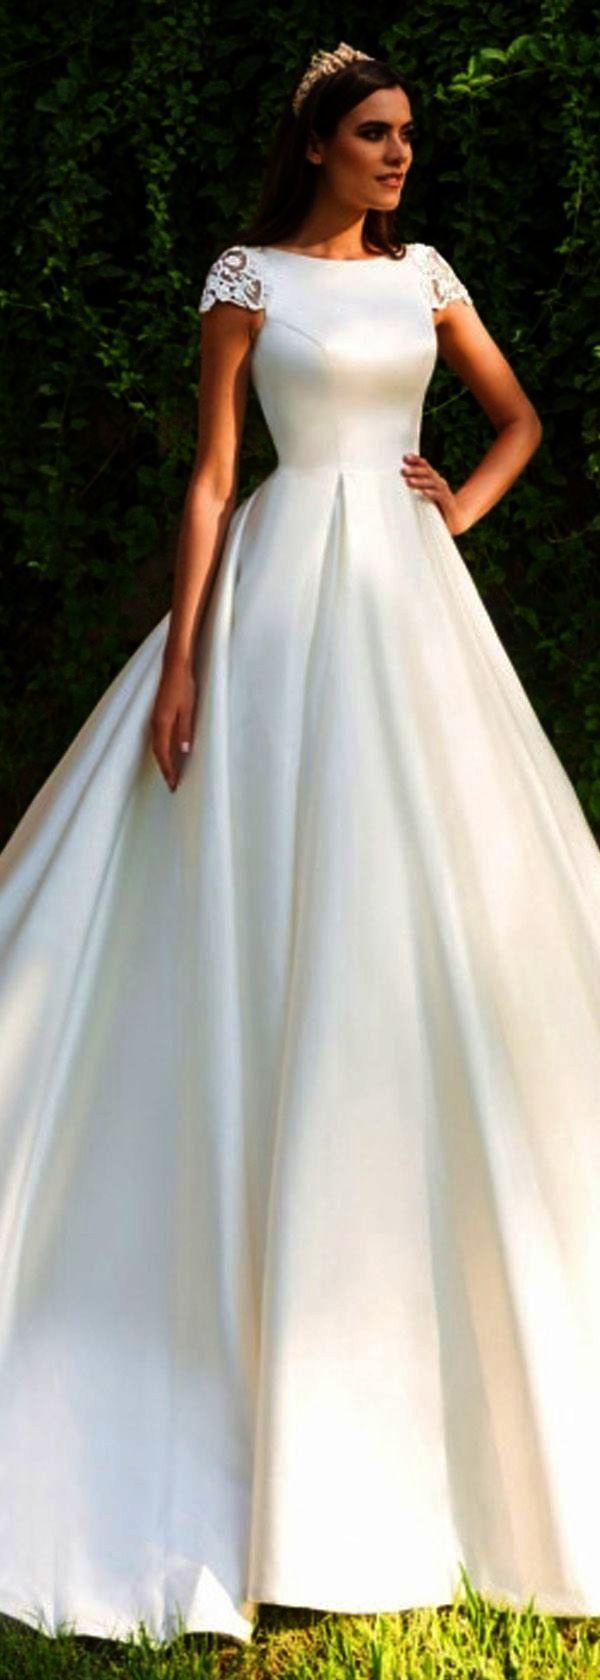 Lace Wedding Dresses Ivory Lace Wedding Dress Layered Vestido De Casamento Simples Vestido De Casamento Vestido De Noiva